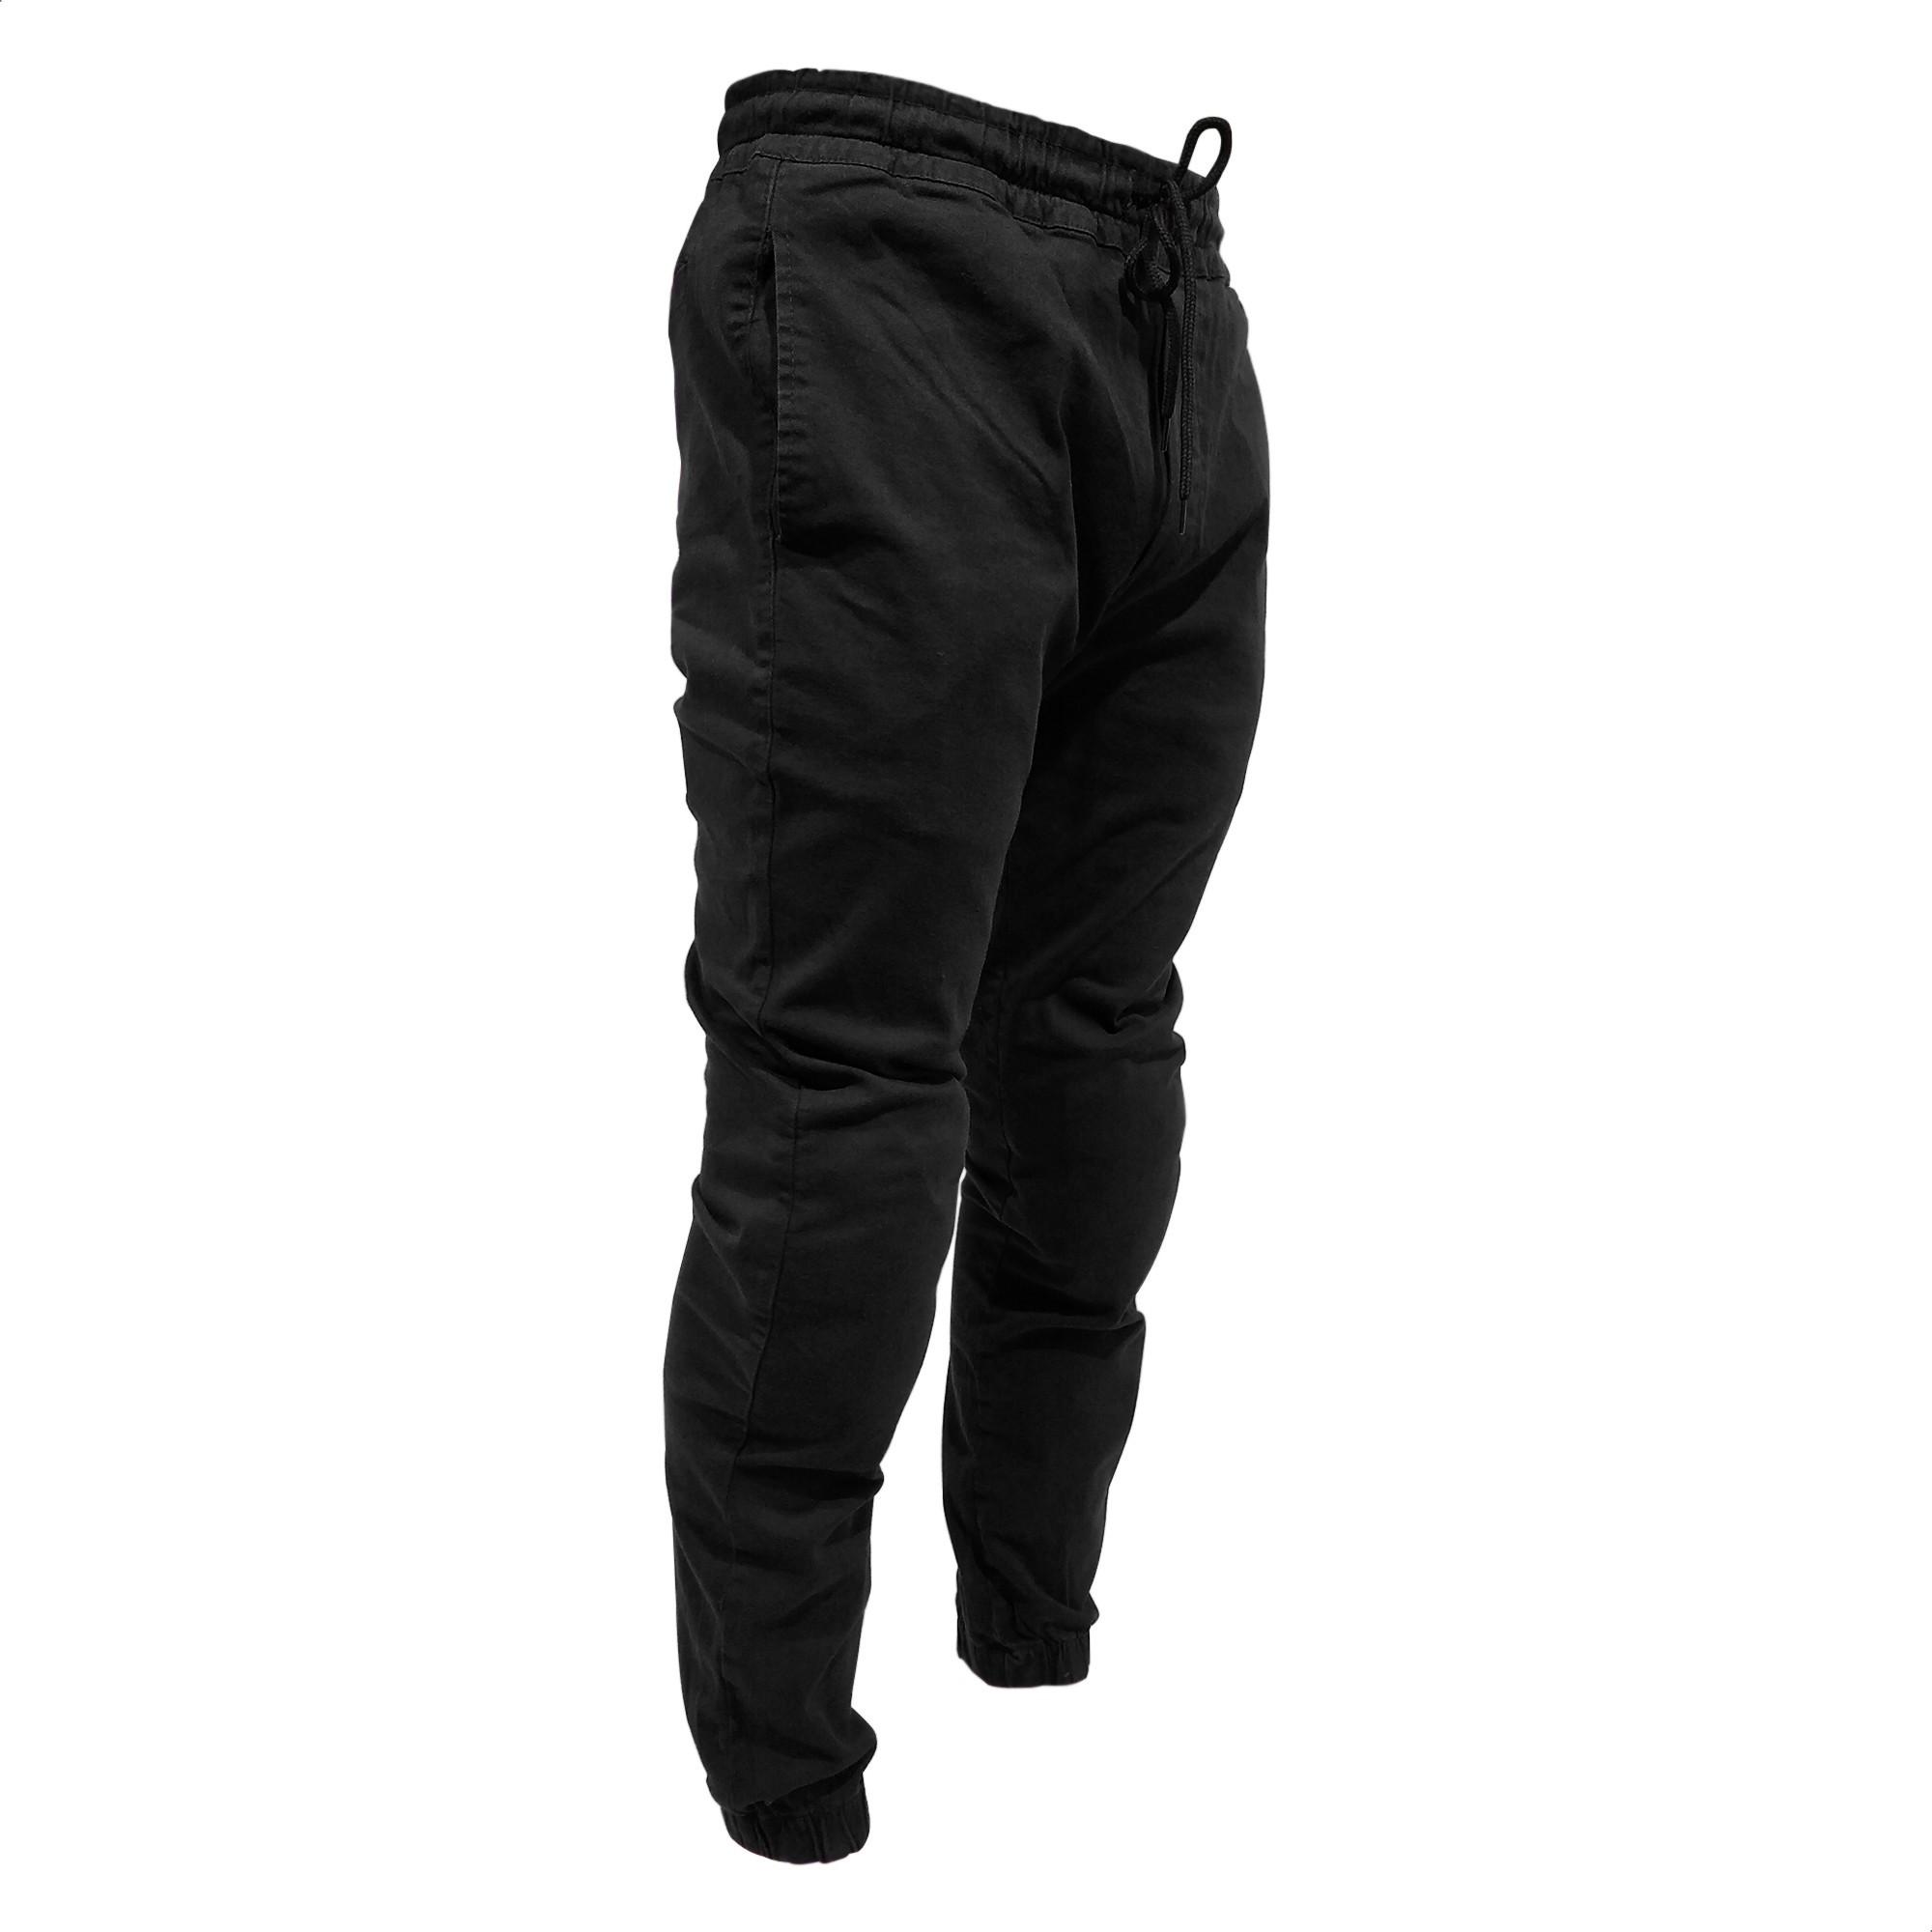 Pantalon Urbano Samurai Warrior Jogger con Proteccion Negro